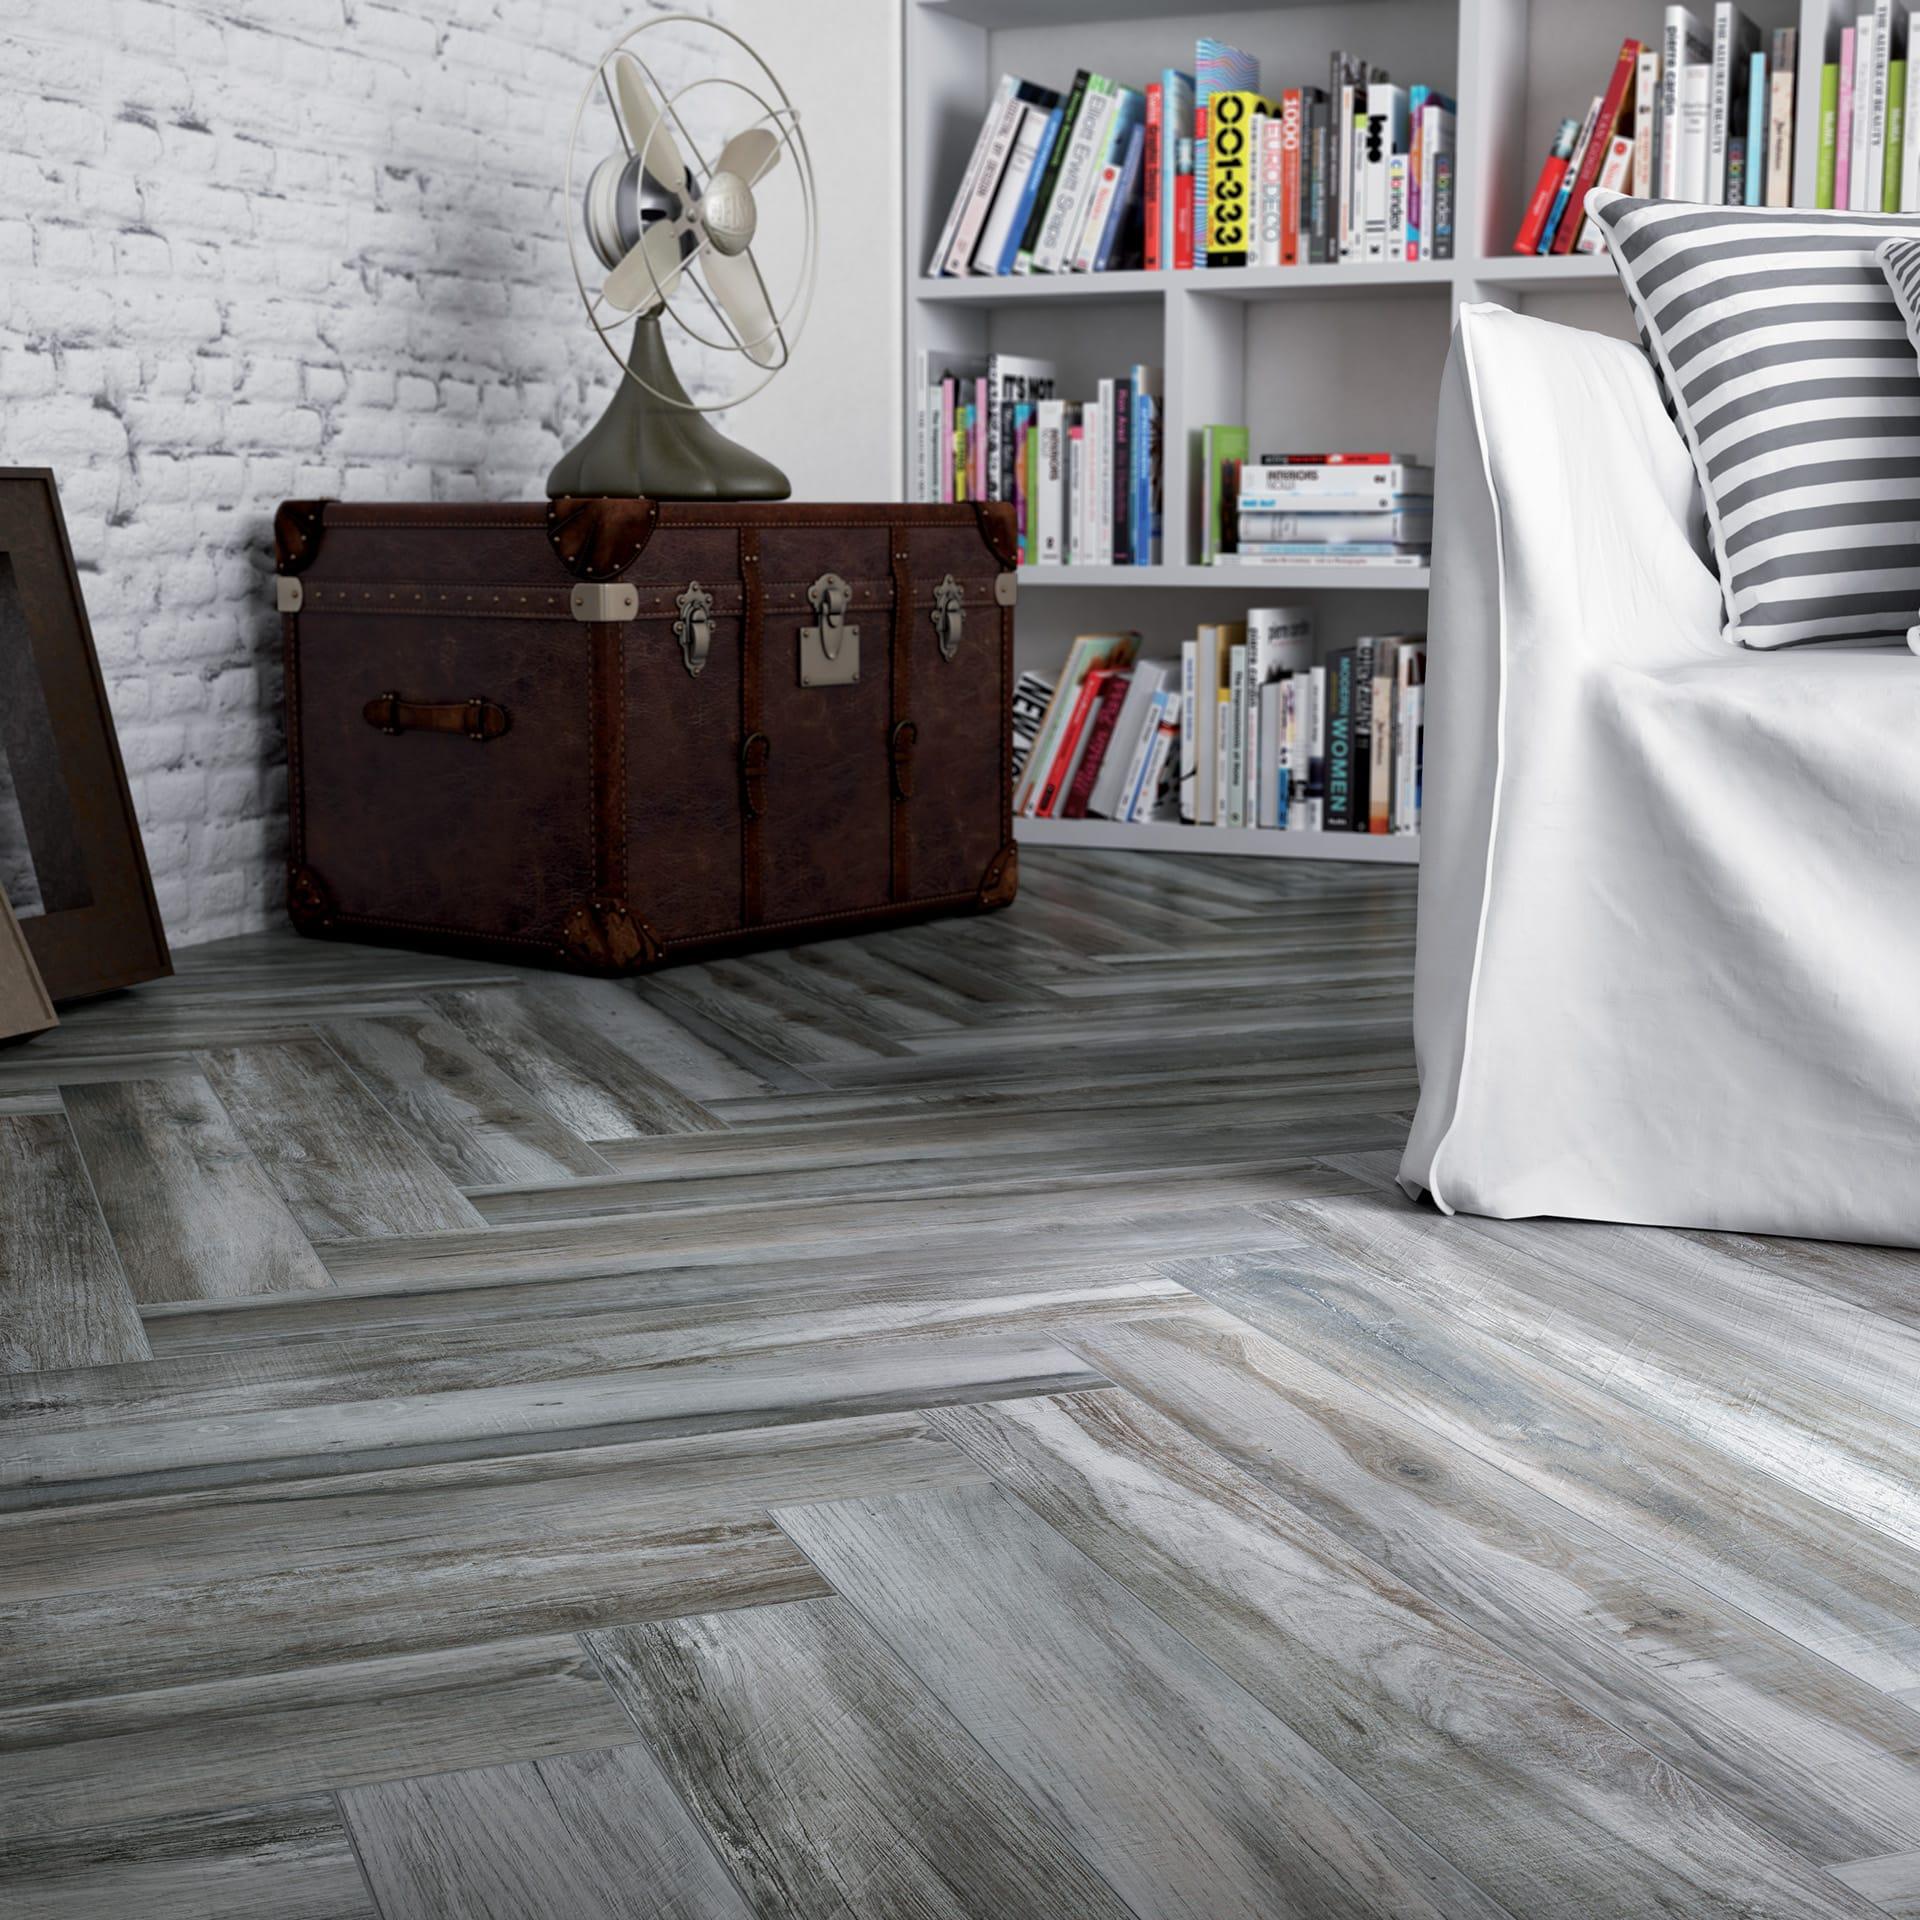 Wooden Floor Tiles and Wood Effect Porcelain Tiles Barriques by